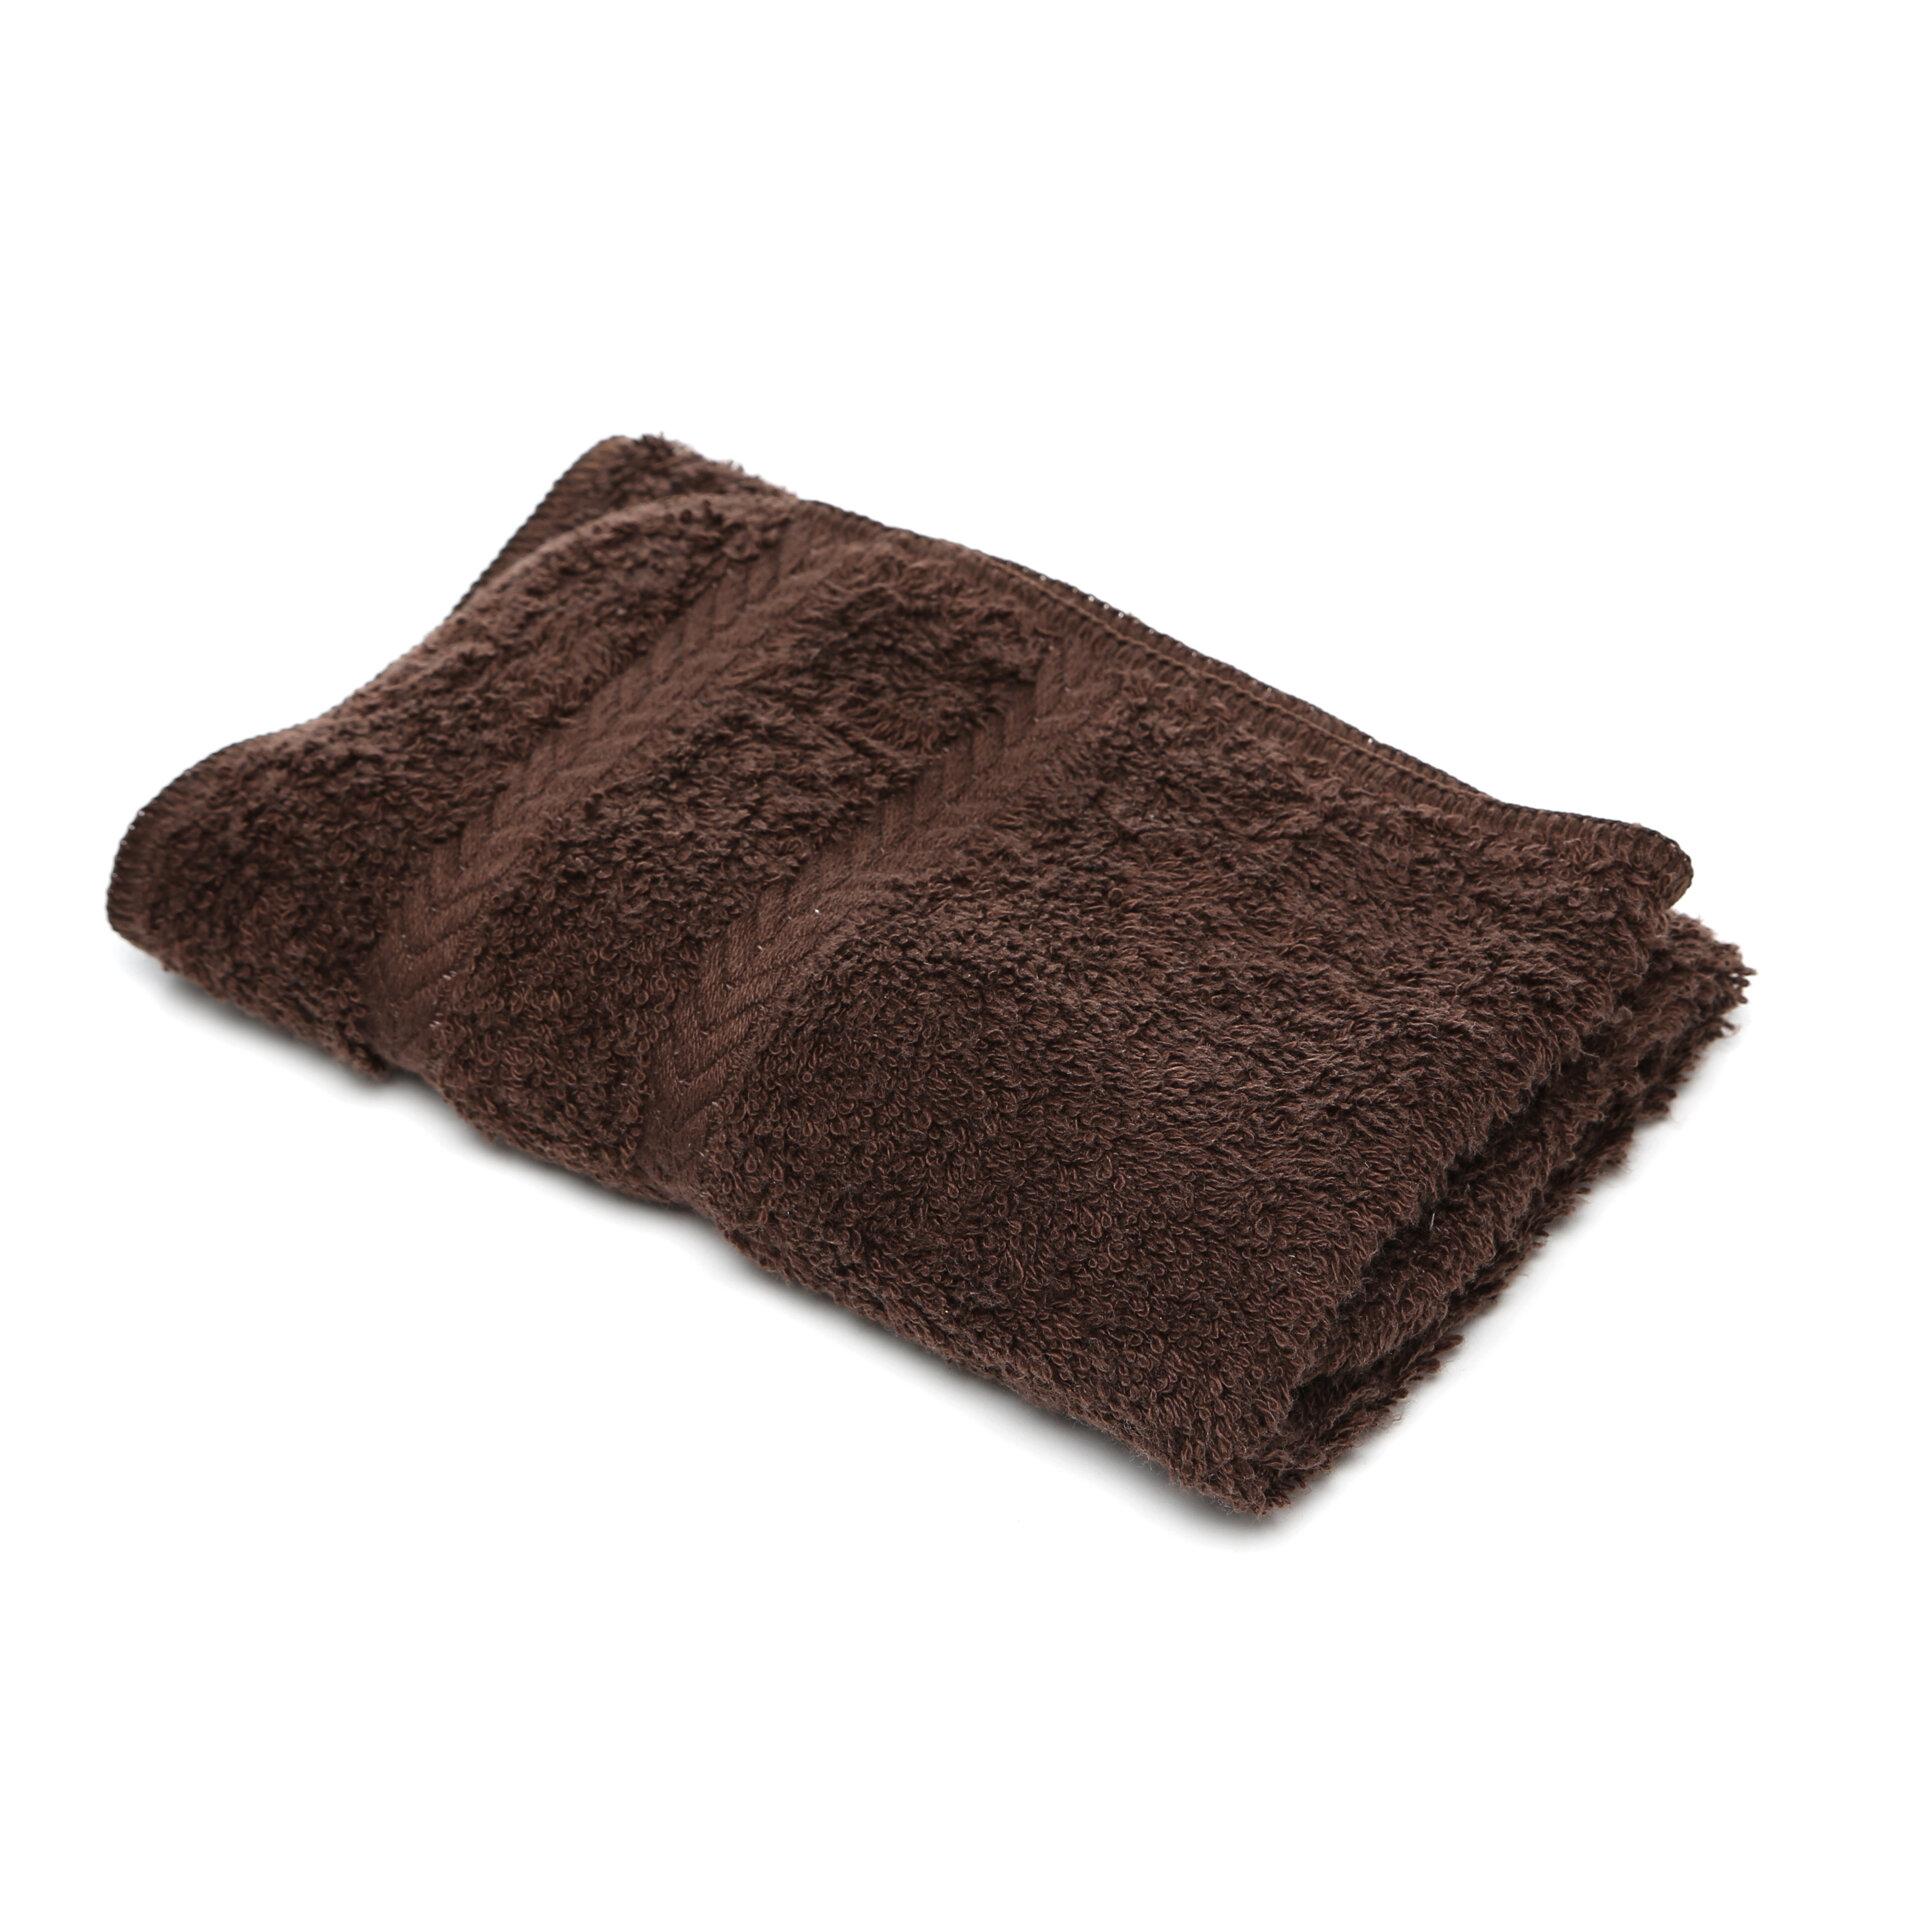 Martex Egyptian Egyptian Quality Cotton Bath Towel Reviews Wayfair